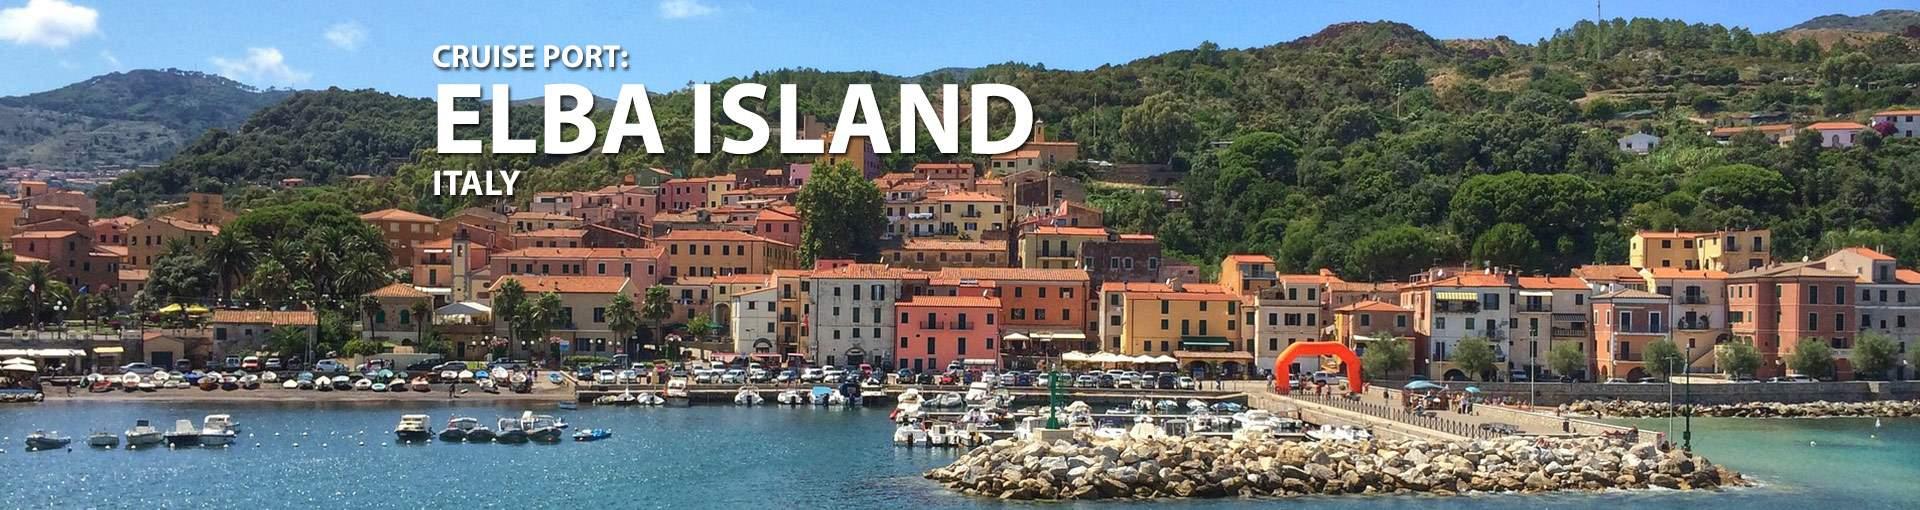 Elba Island, Italy Cruise Port